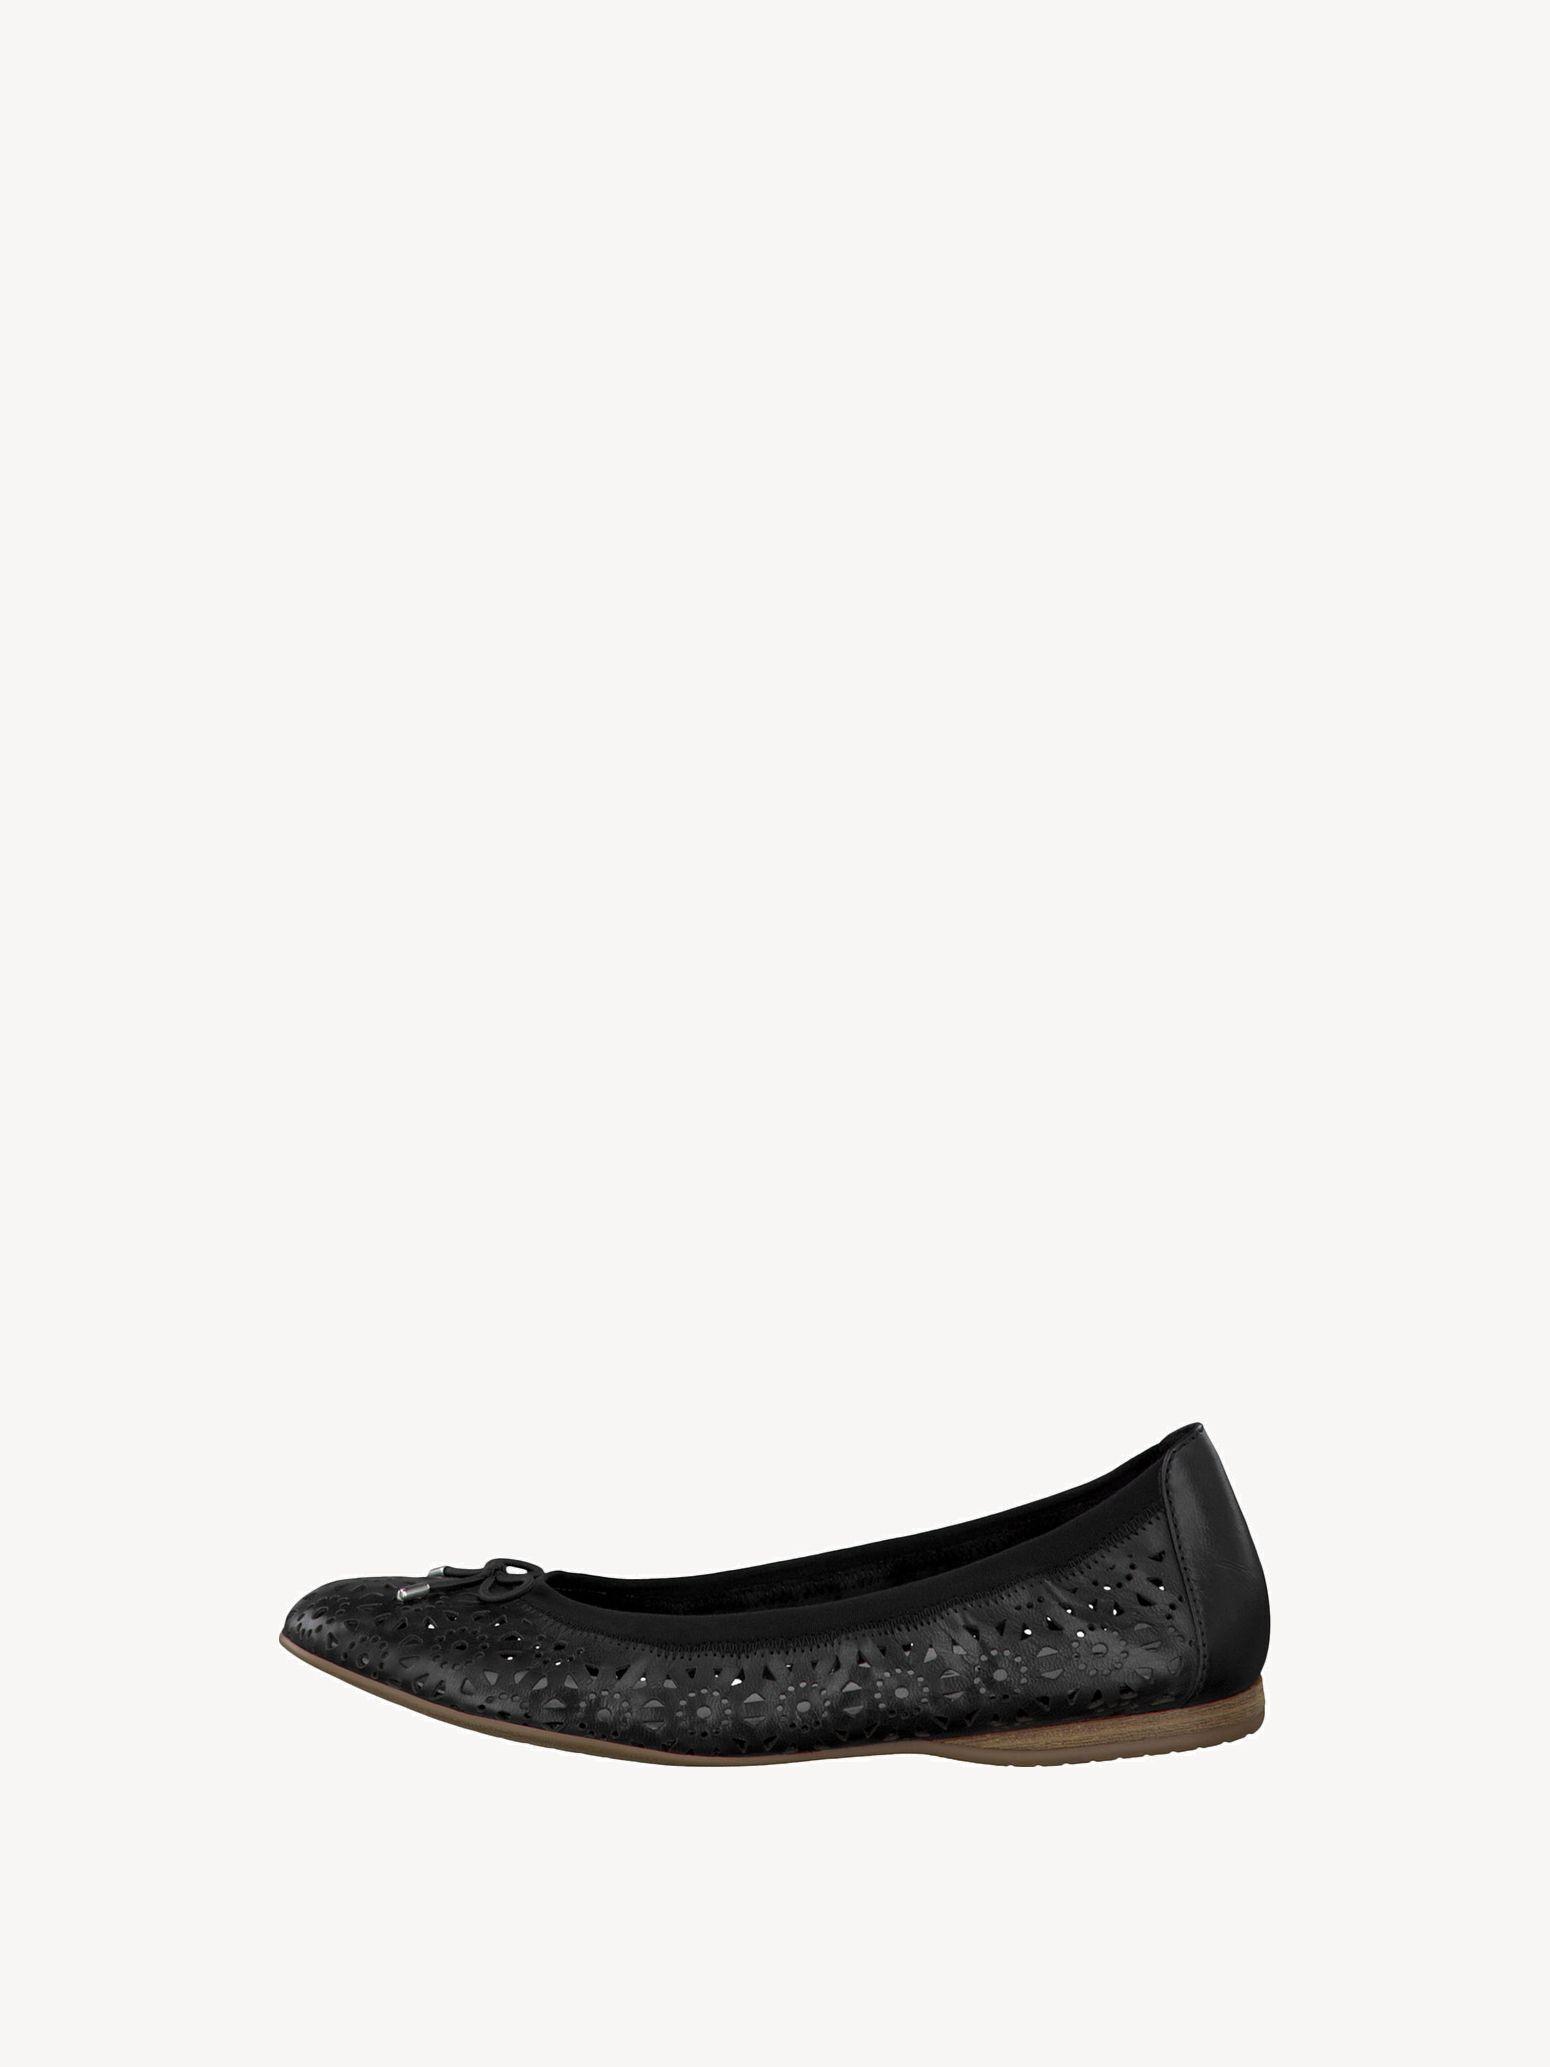 Tamaris 22116 Denim Chaussures femmes printemps été Femme